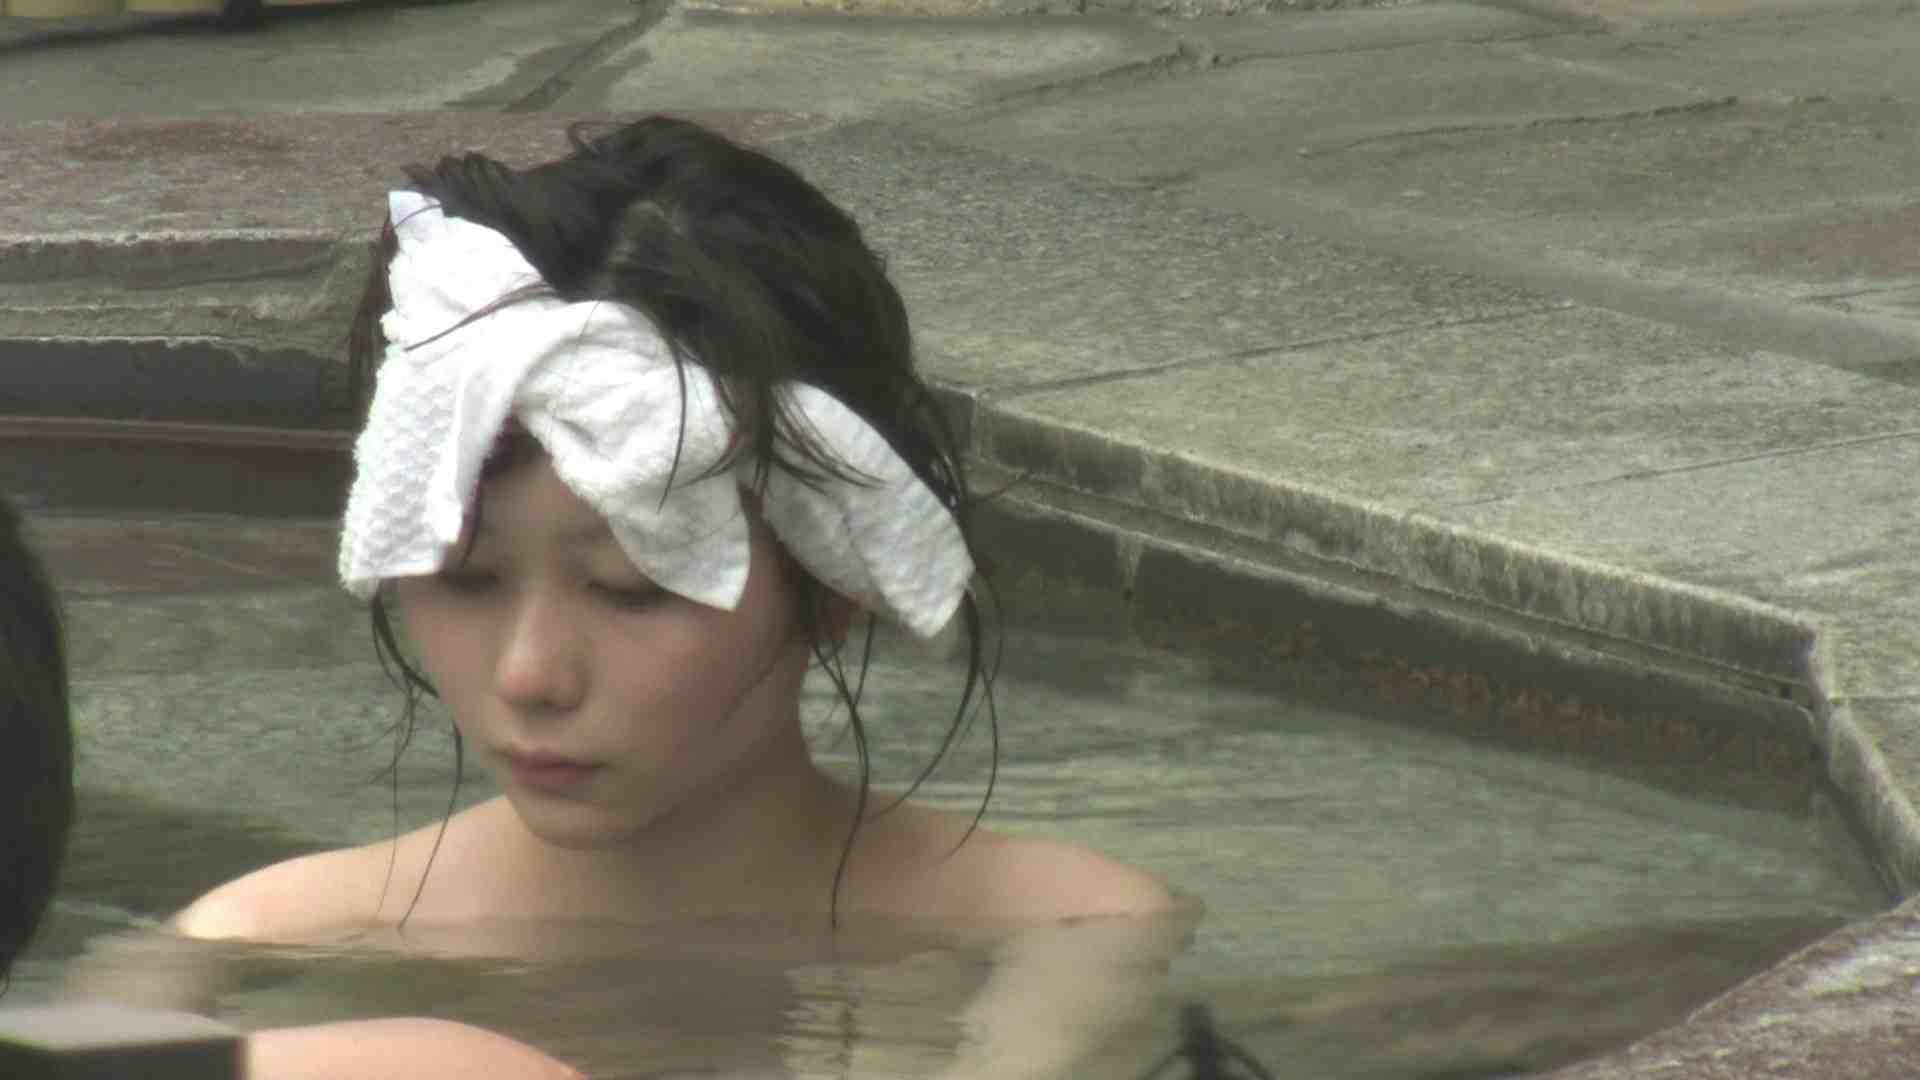 Aquaな露天風呂Vol.147 綺麗なOLたち アダルト動画キャプチャ 102枚 8